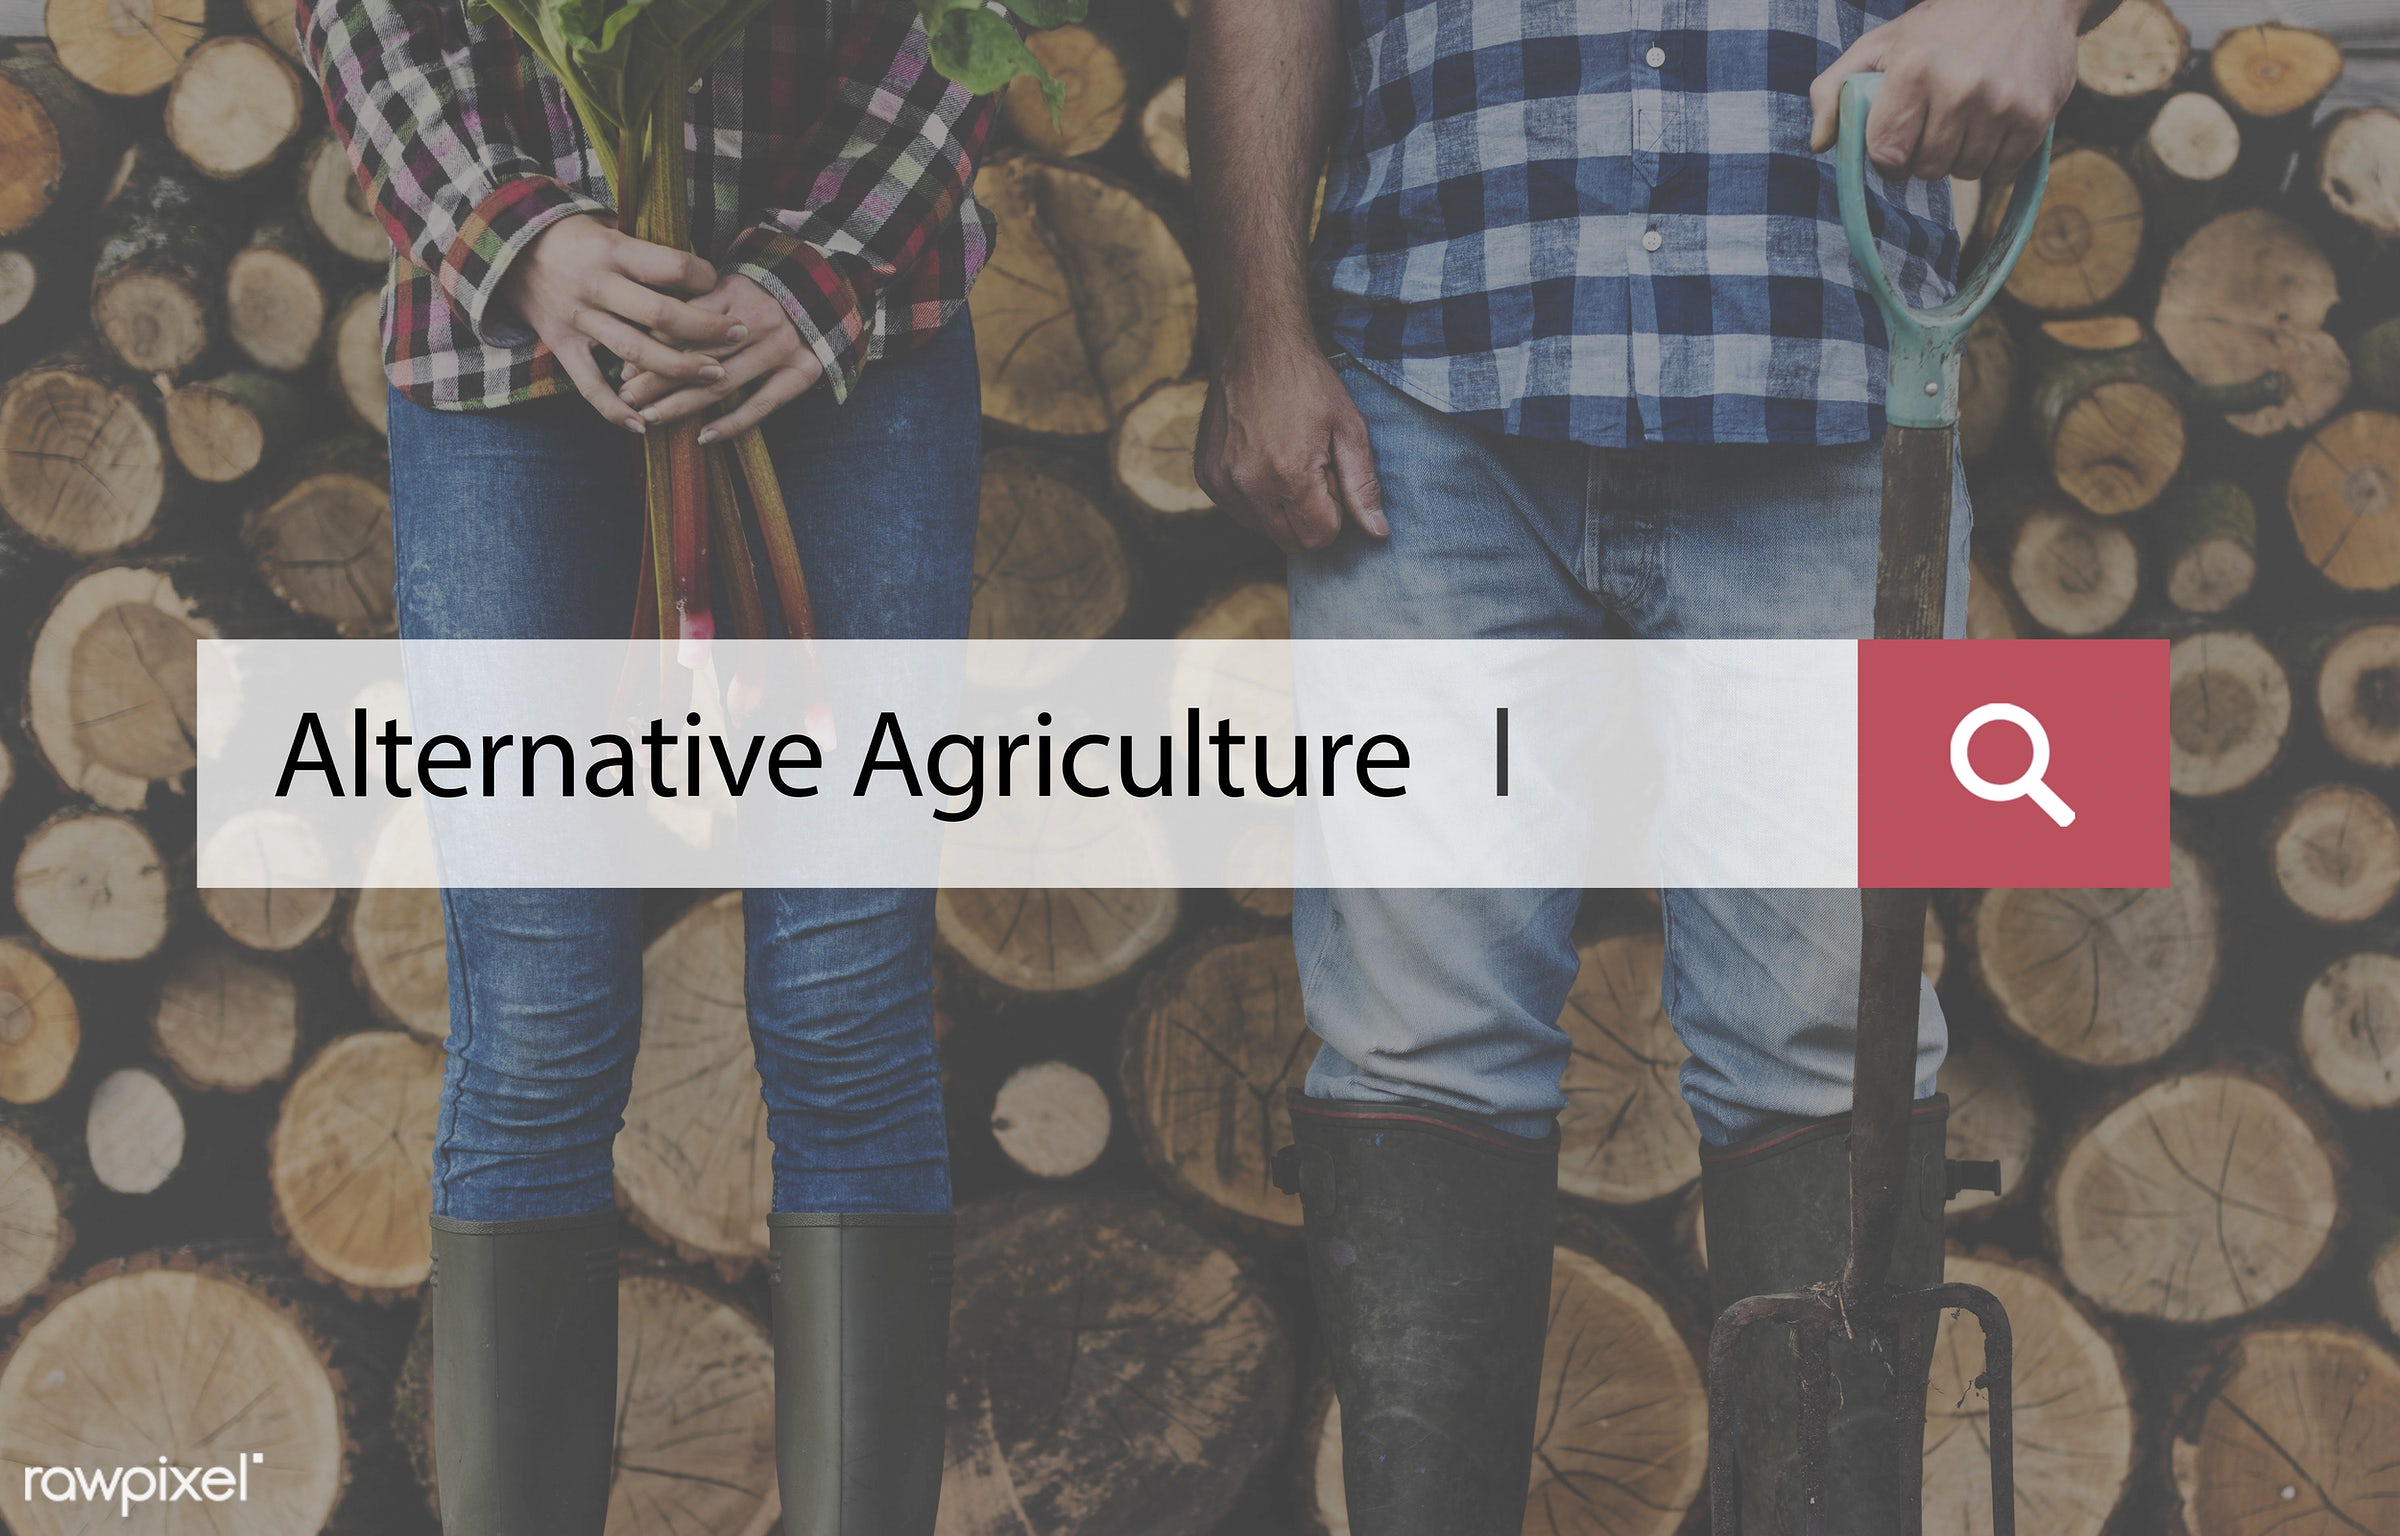 caucasian, farm, farmer, firewood, hands, holding, jeans, legs, log, lumber, men, natural, plant, shovel, stack, stand,...